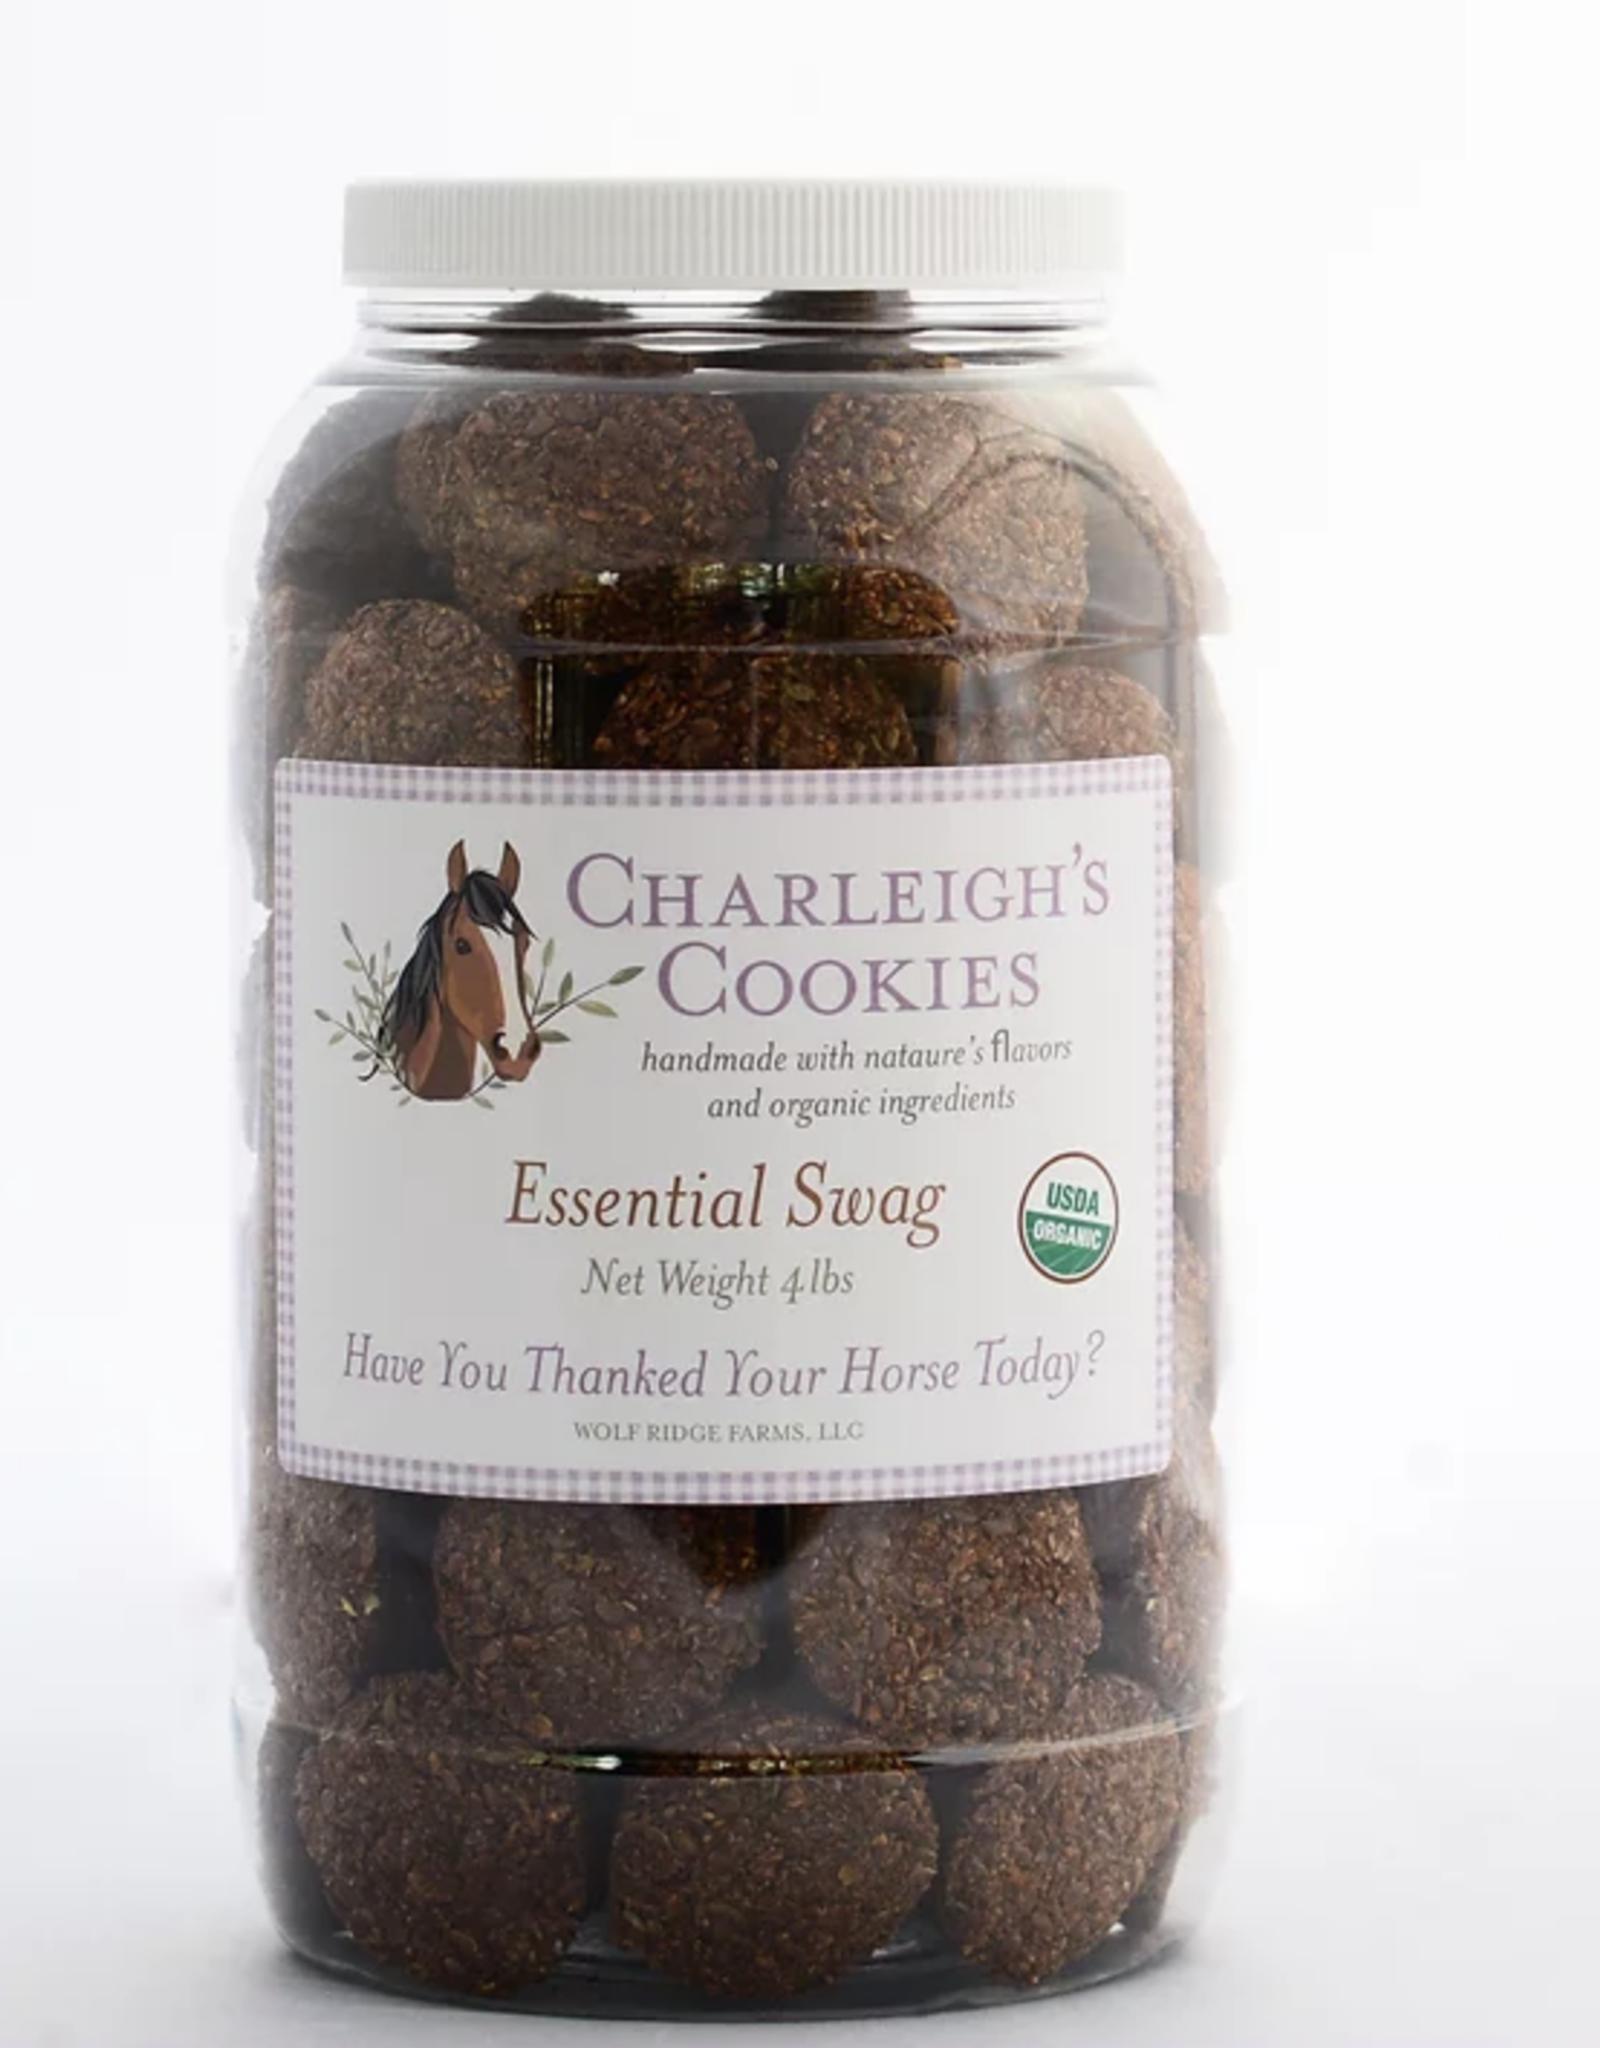 Charleigh's Cookies Charleigh's Cookies Essential Swag 4lb Cookie Jar